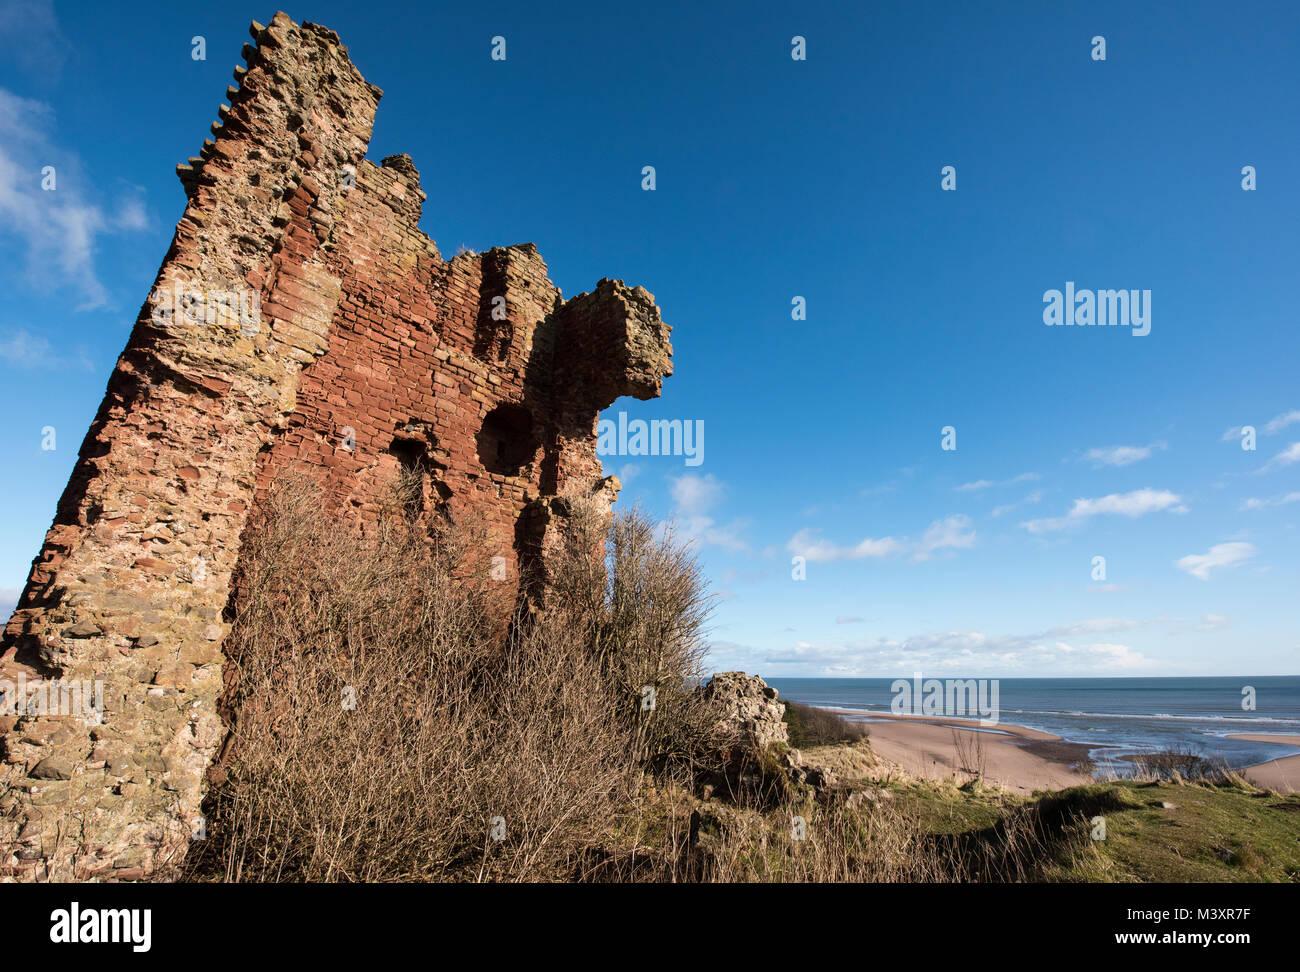 Red Castle Lunan Bay, Angus, Scotland. - Stock Image